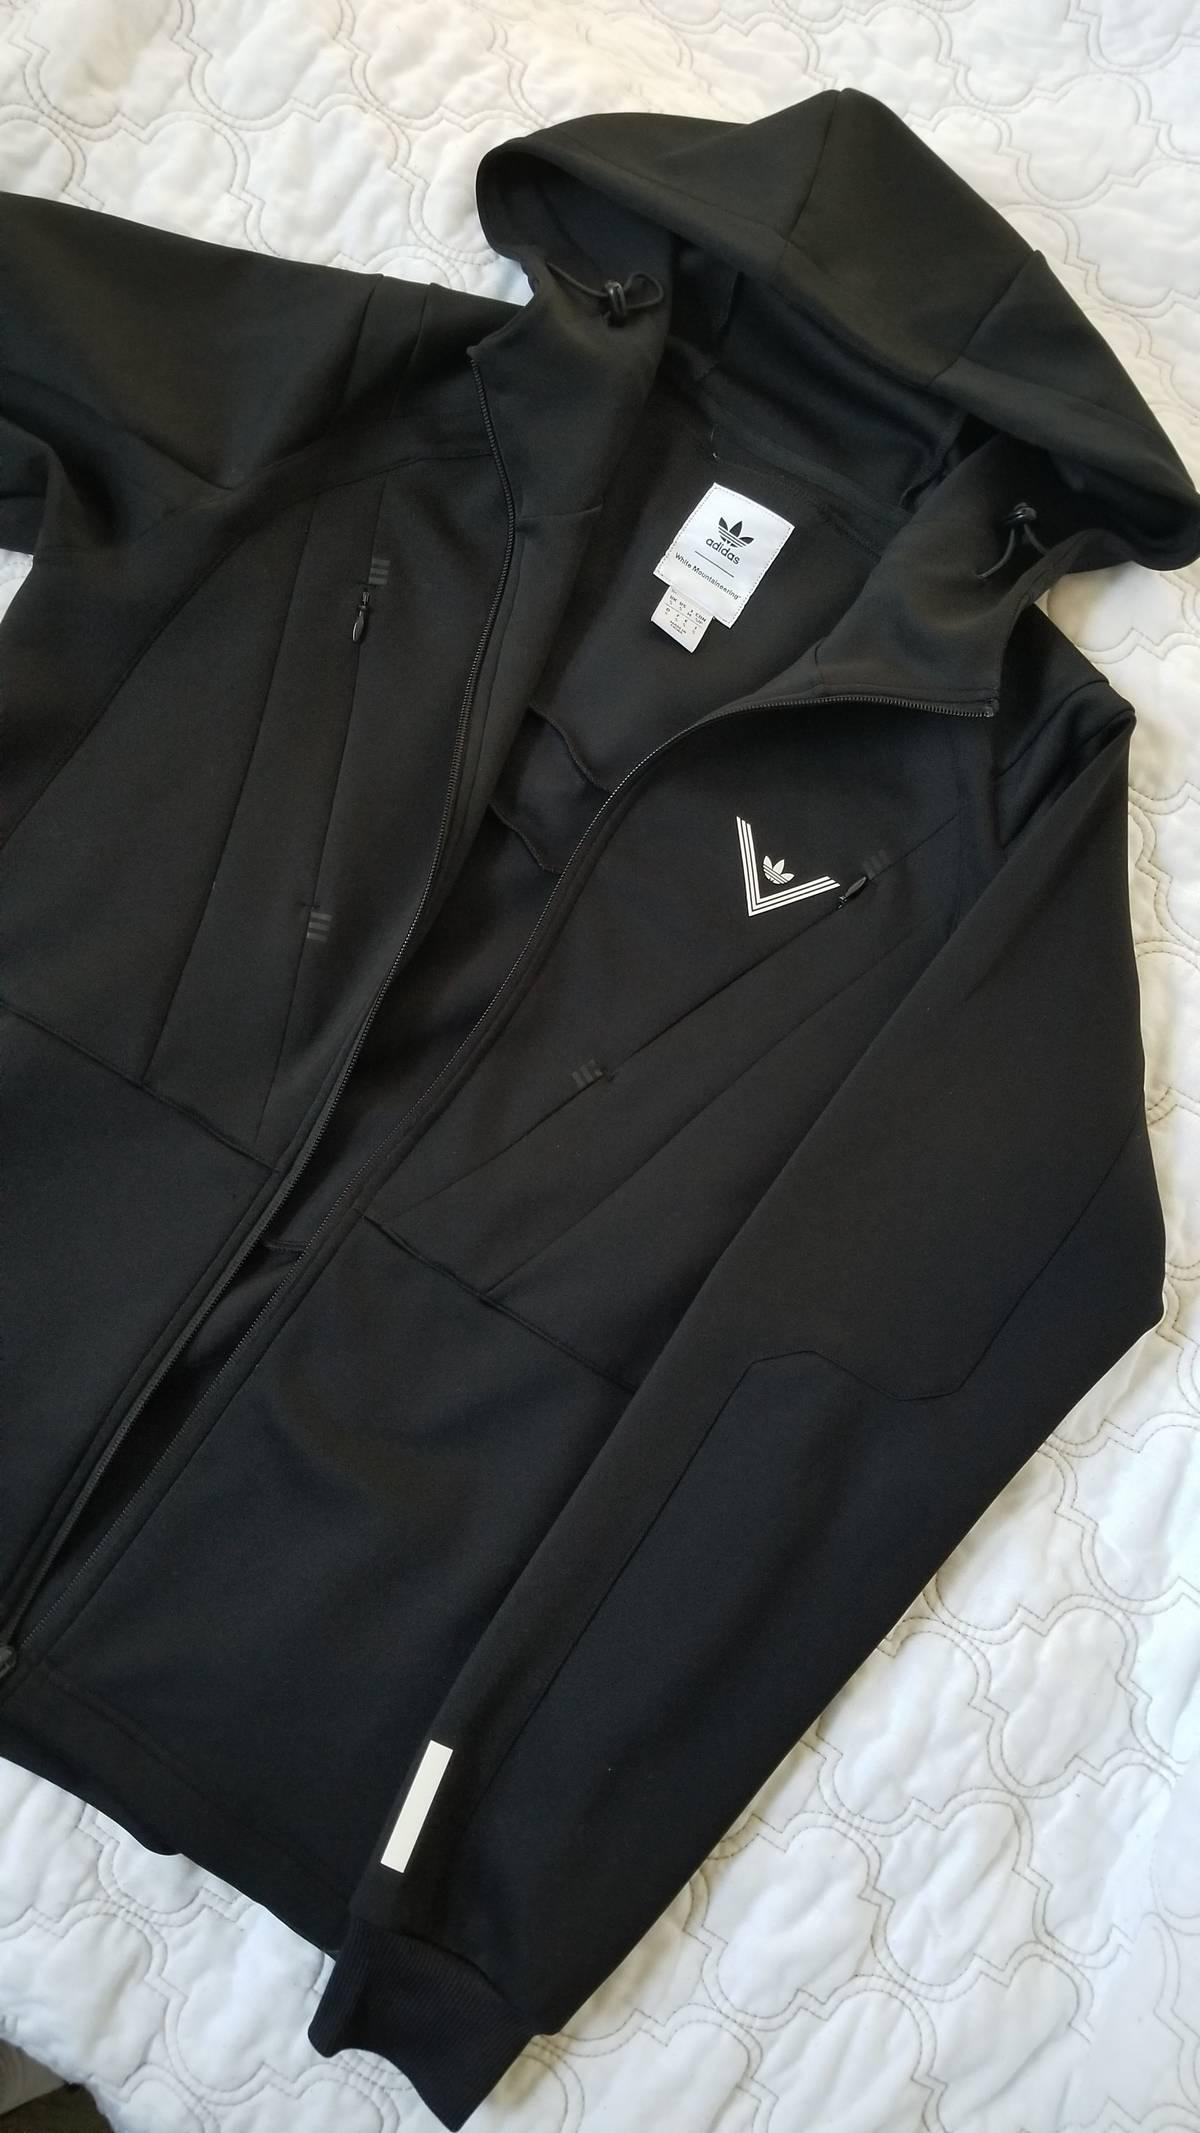 Adidas × White Mountaineering Wm Hooded Track Jacket Size S $80